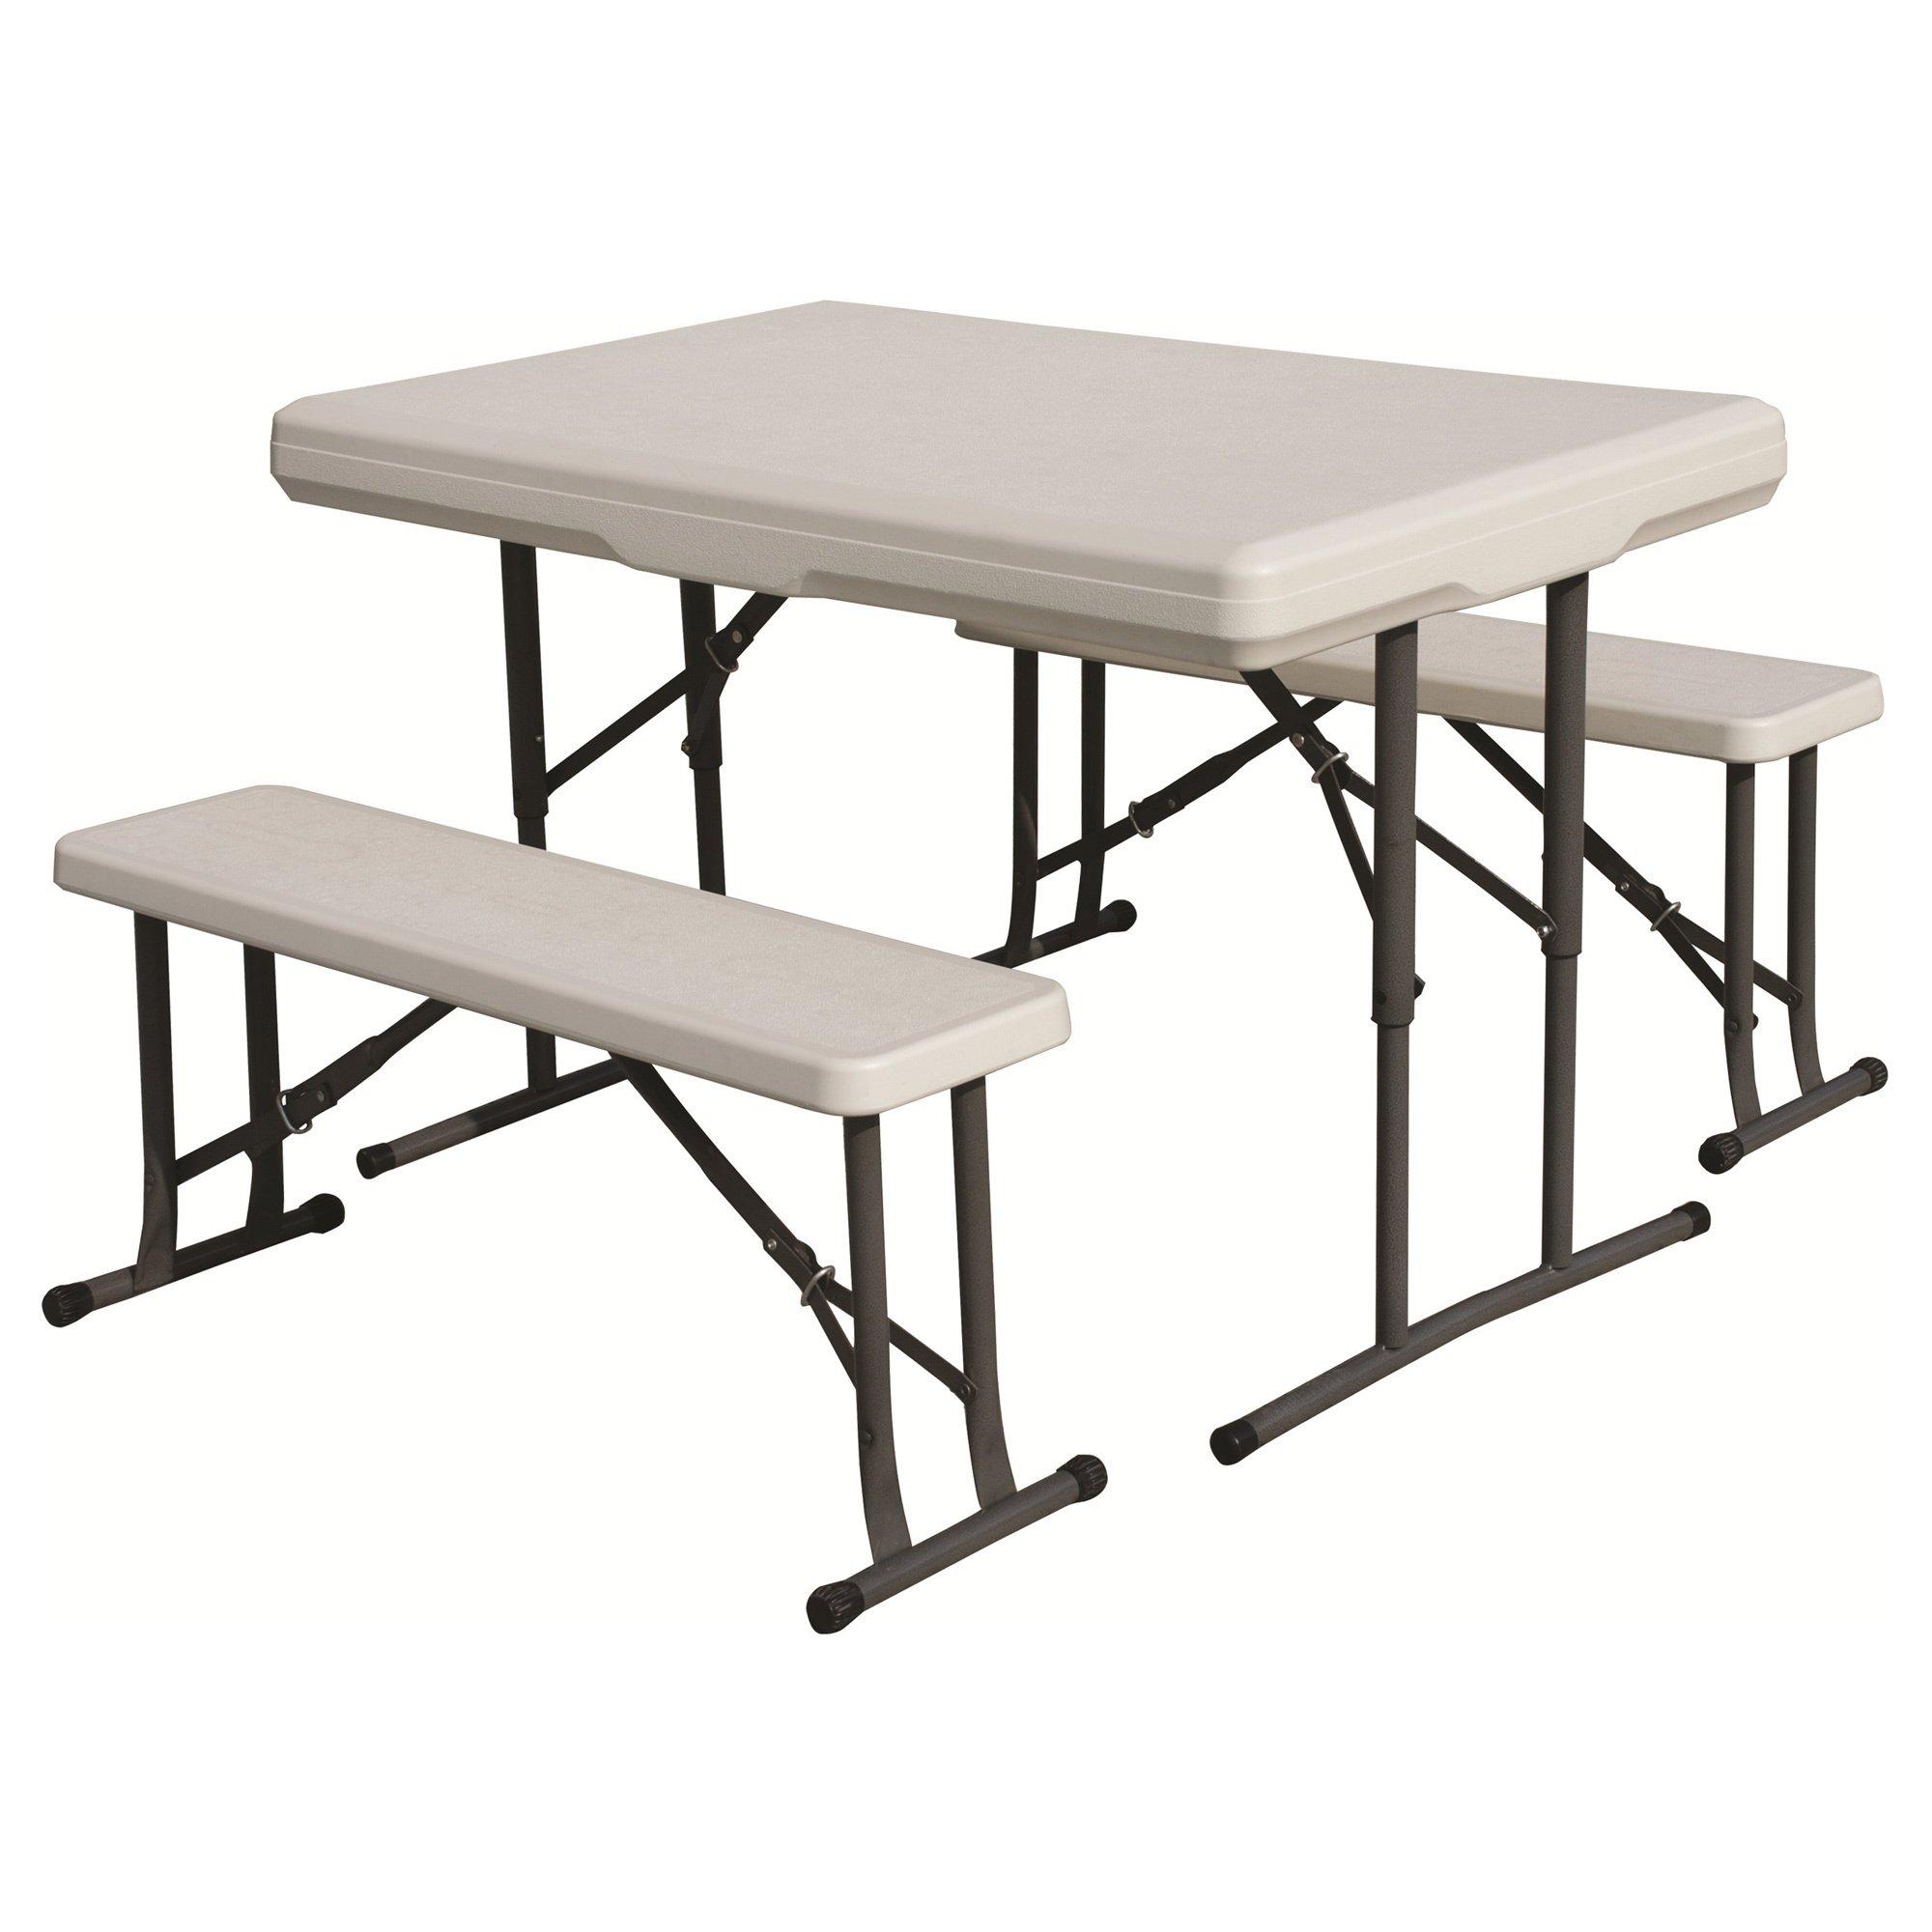 Folding Tbl W Bench Seats Wht ''Prod. Type: Camping/Furniture''